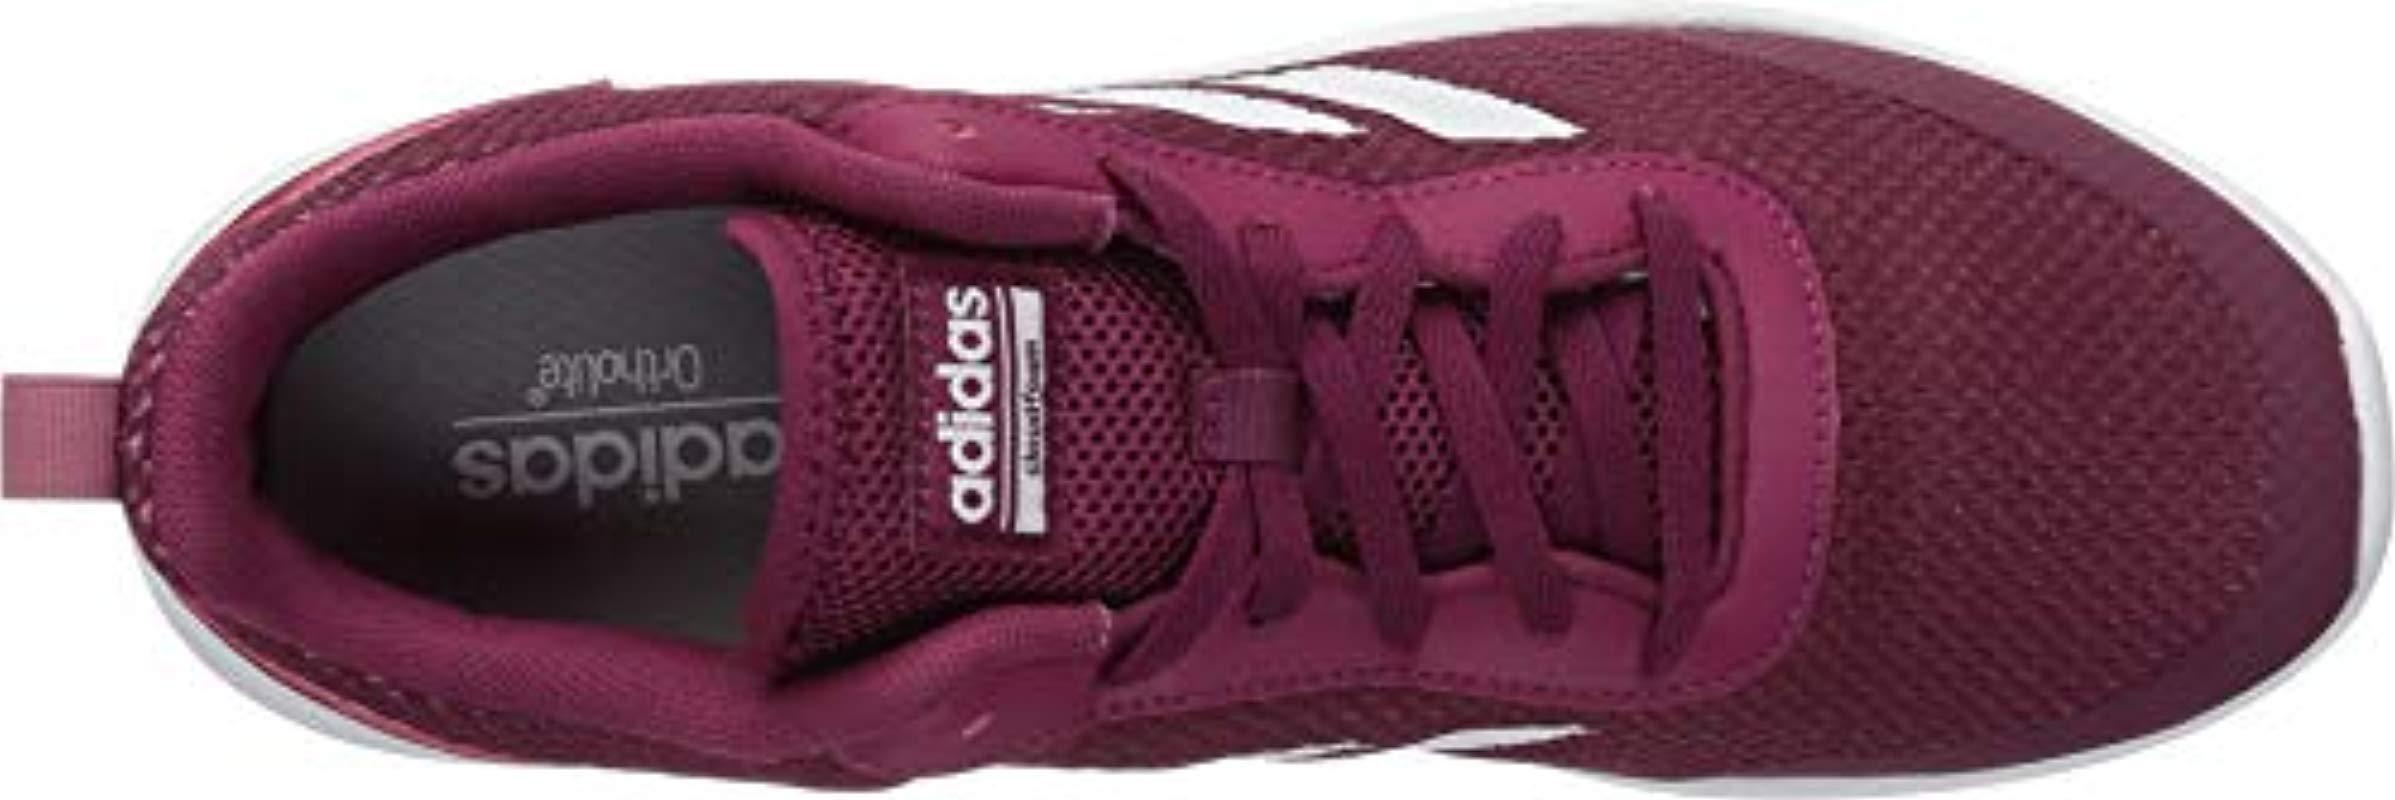 Adidas - Purple Cf Element Race W Running Shoe - Lyst. View fullscreen 0db818db35cdf